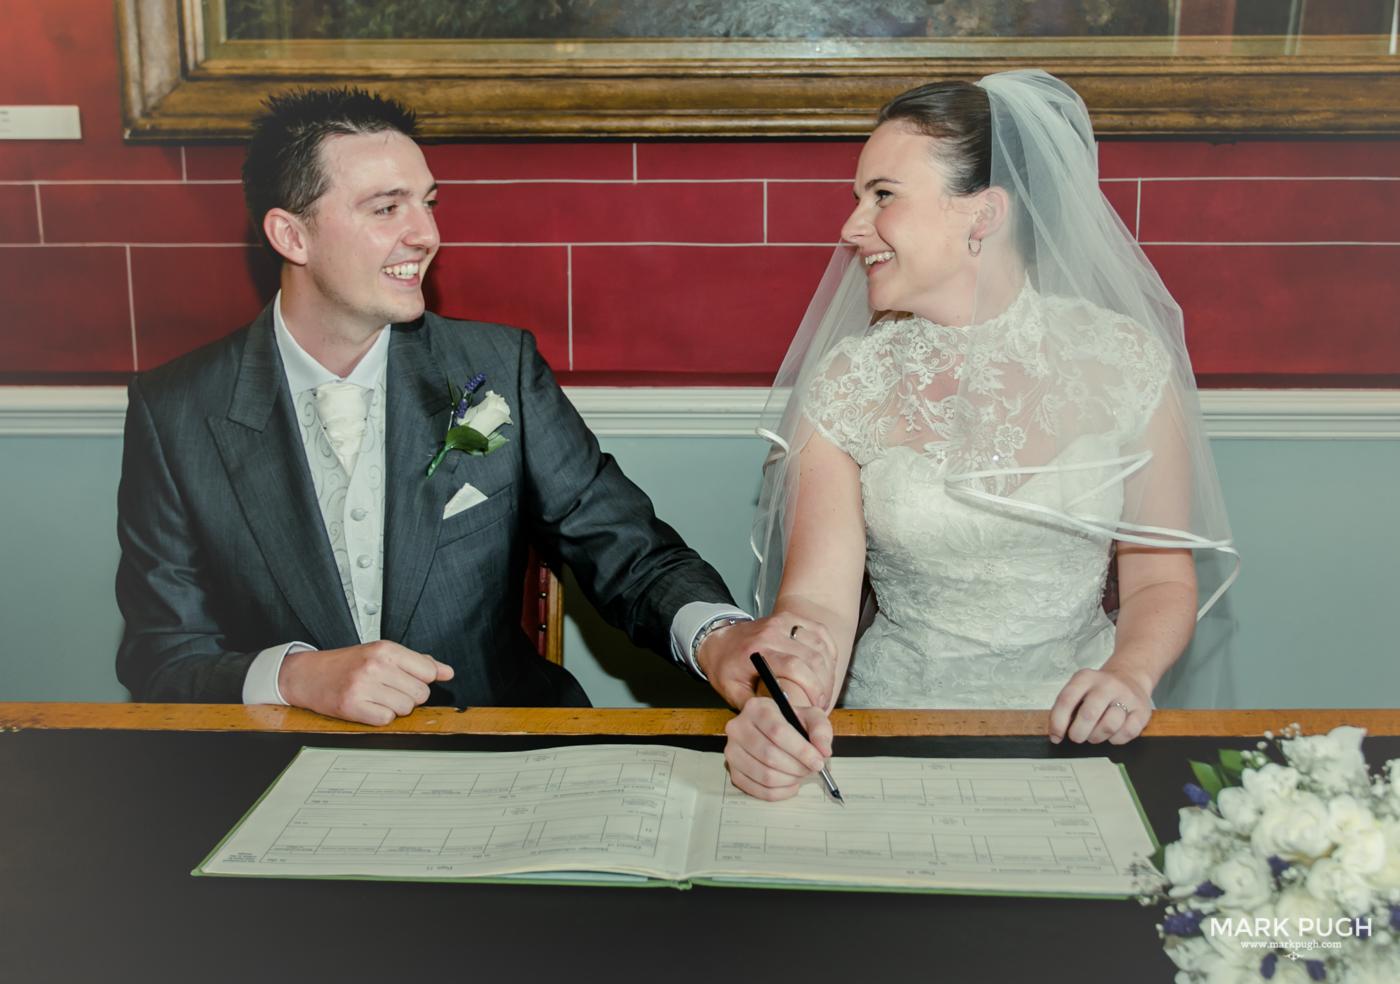 099- Laura and Peter - Wollaton Hall Wedding Nottingham UK by Mark Pugh www.markpugh.com.jpg